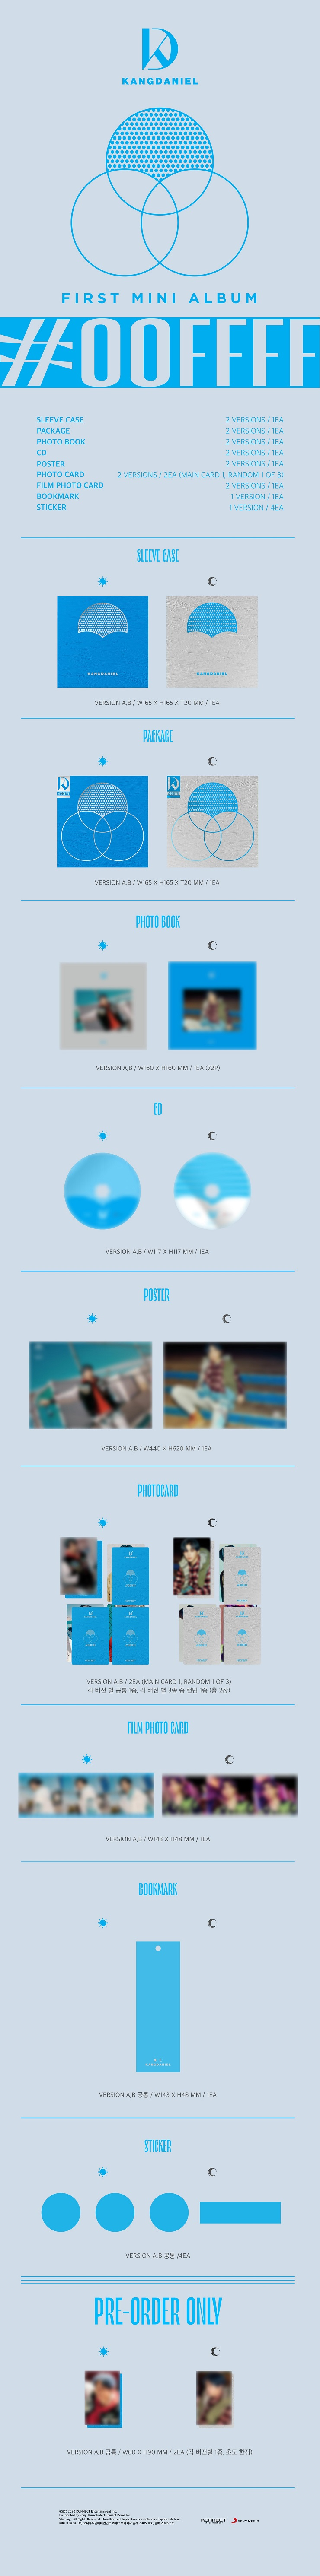 http://www.musickorea.asia/storage/woo680821KR/www/prefix/product/2020/11/O/product.20495.158406313218955.jpg